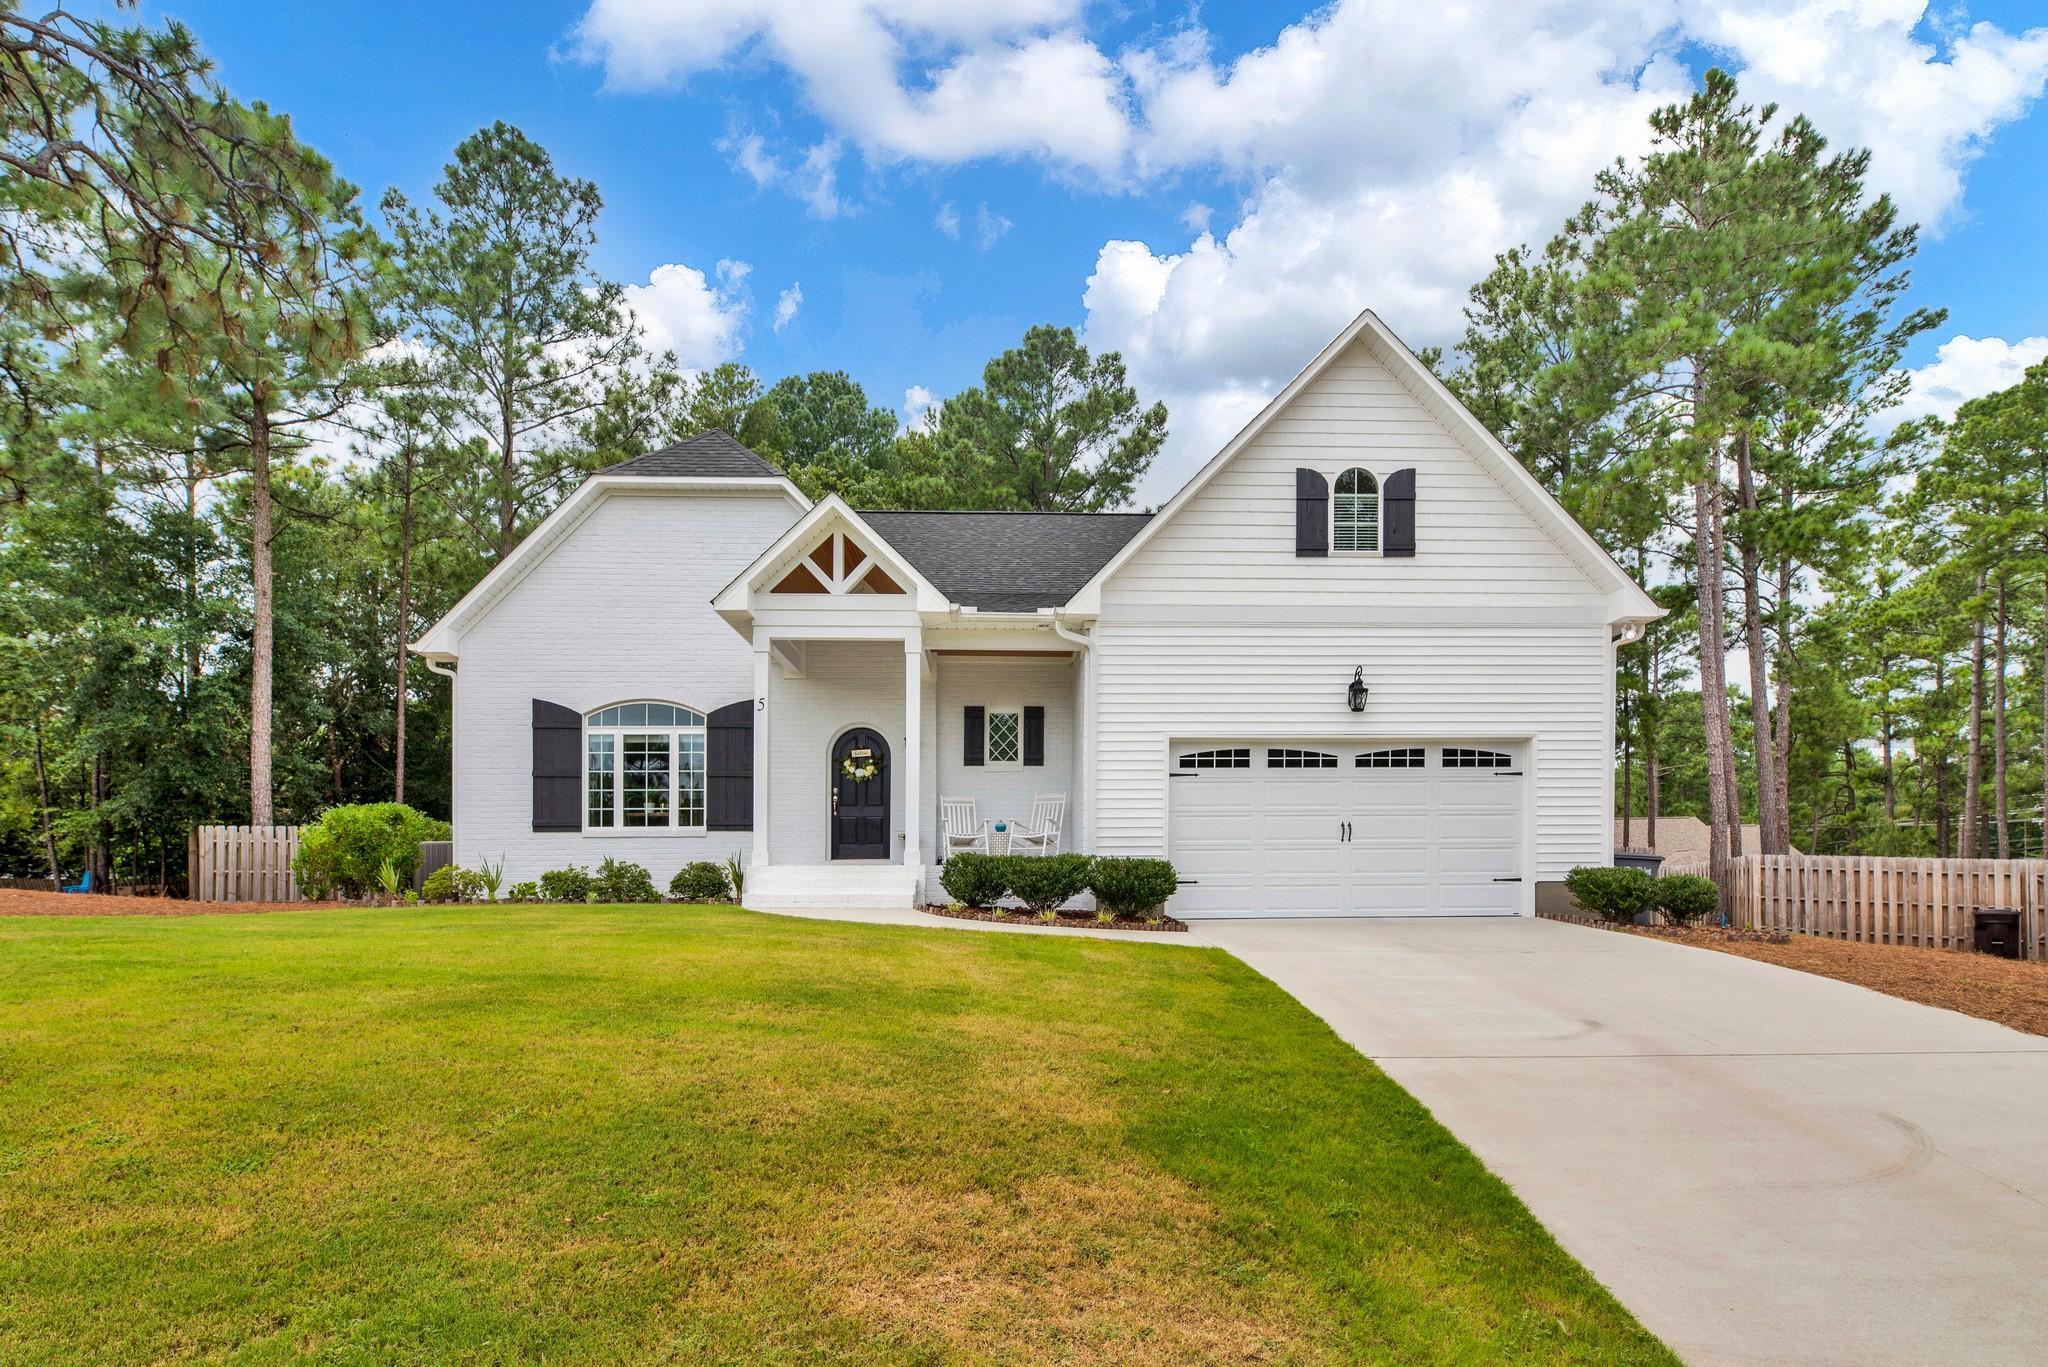 5  Berwyn Court, Pinehurst in Moore County, NC 28374 Home for Sale